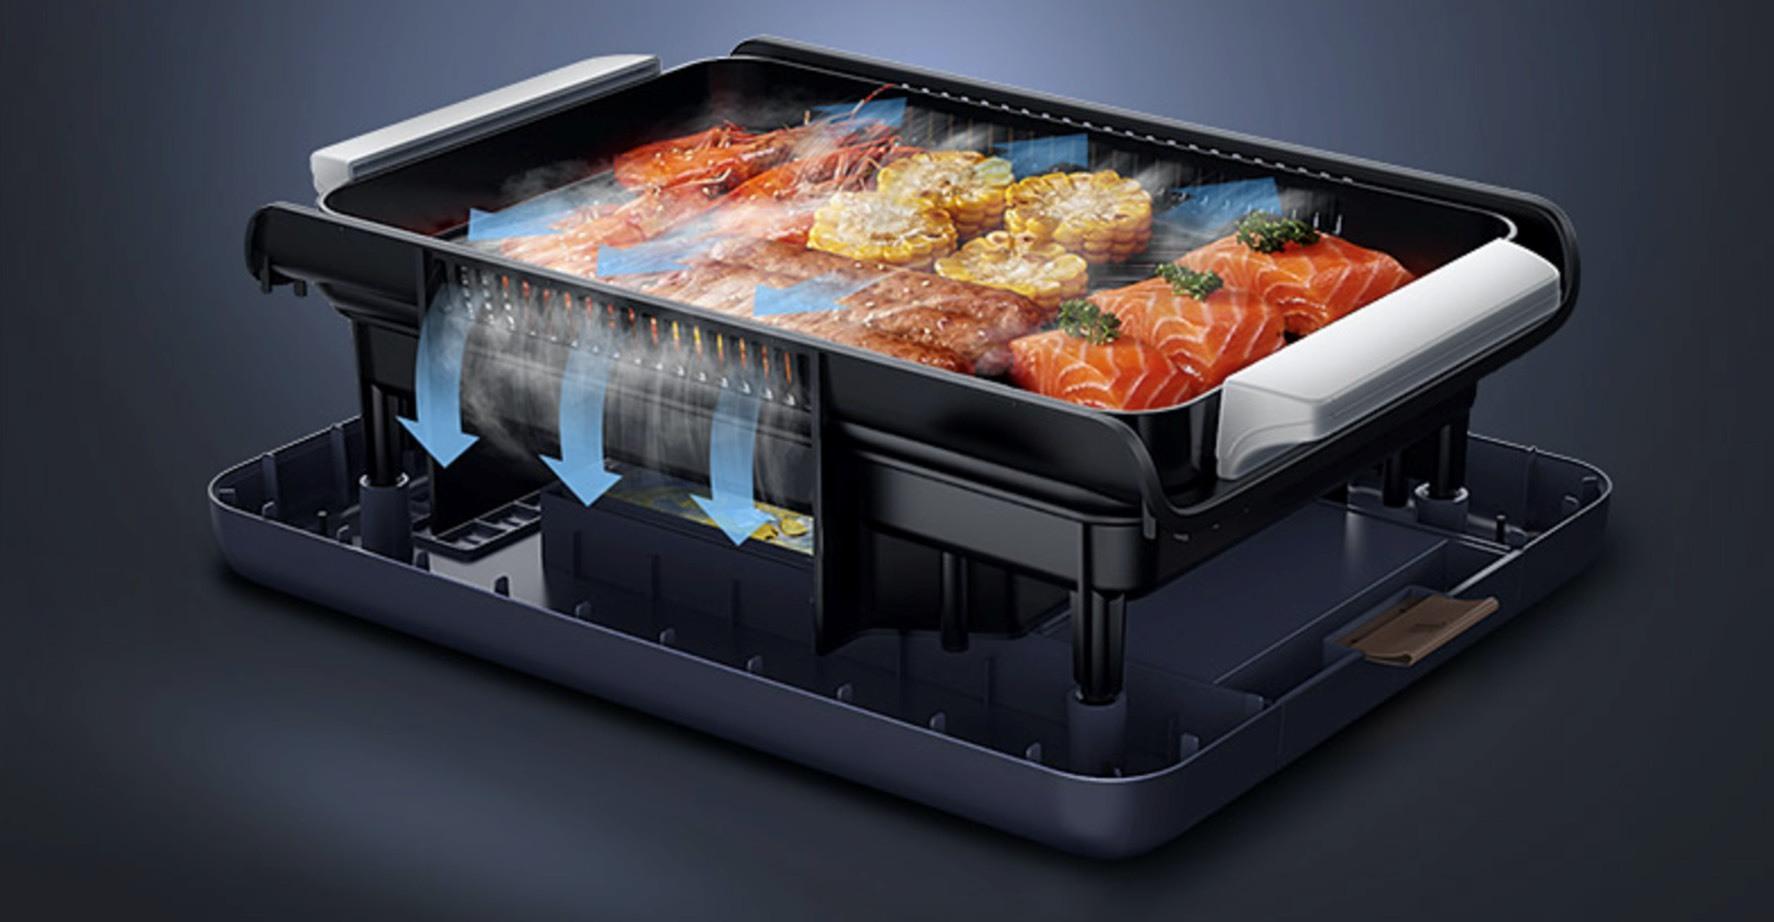 【sOlac】 西班牙品牌 無煙烤盤 SSG-019W 新機到貨 搶先看